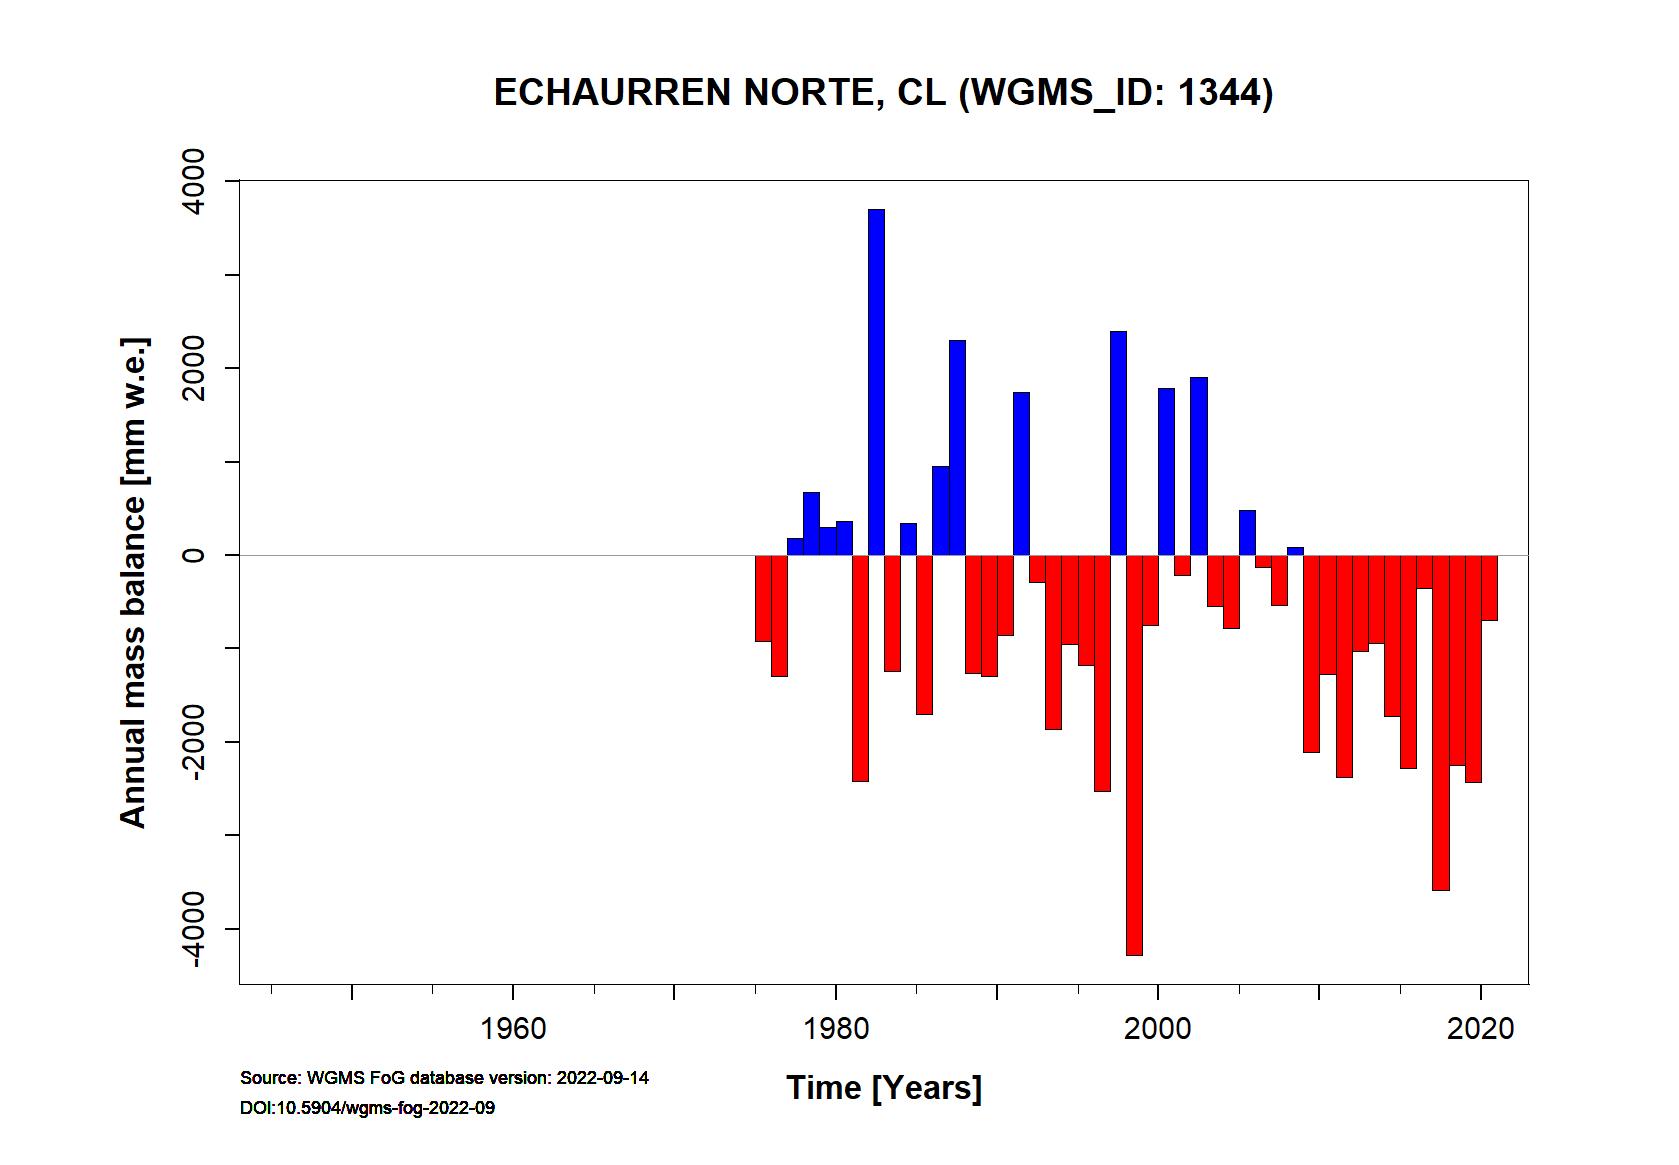 Echaurren Norte glacier Annual Mass Balance (WGMS, 2016)